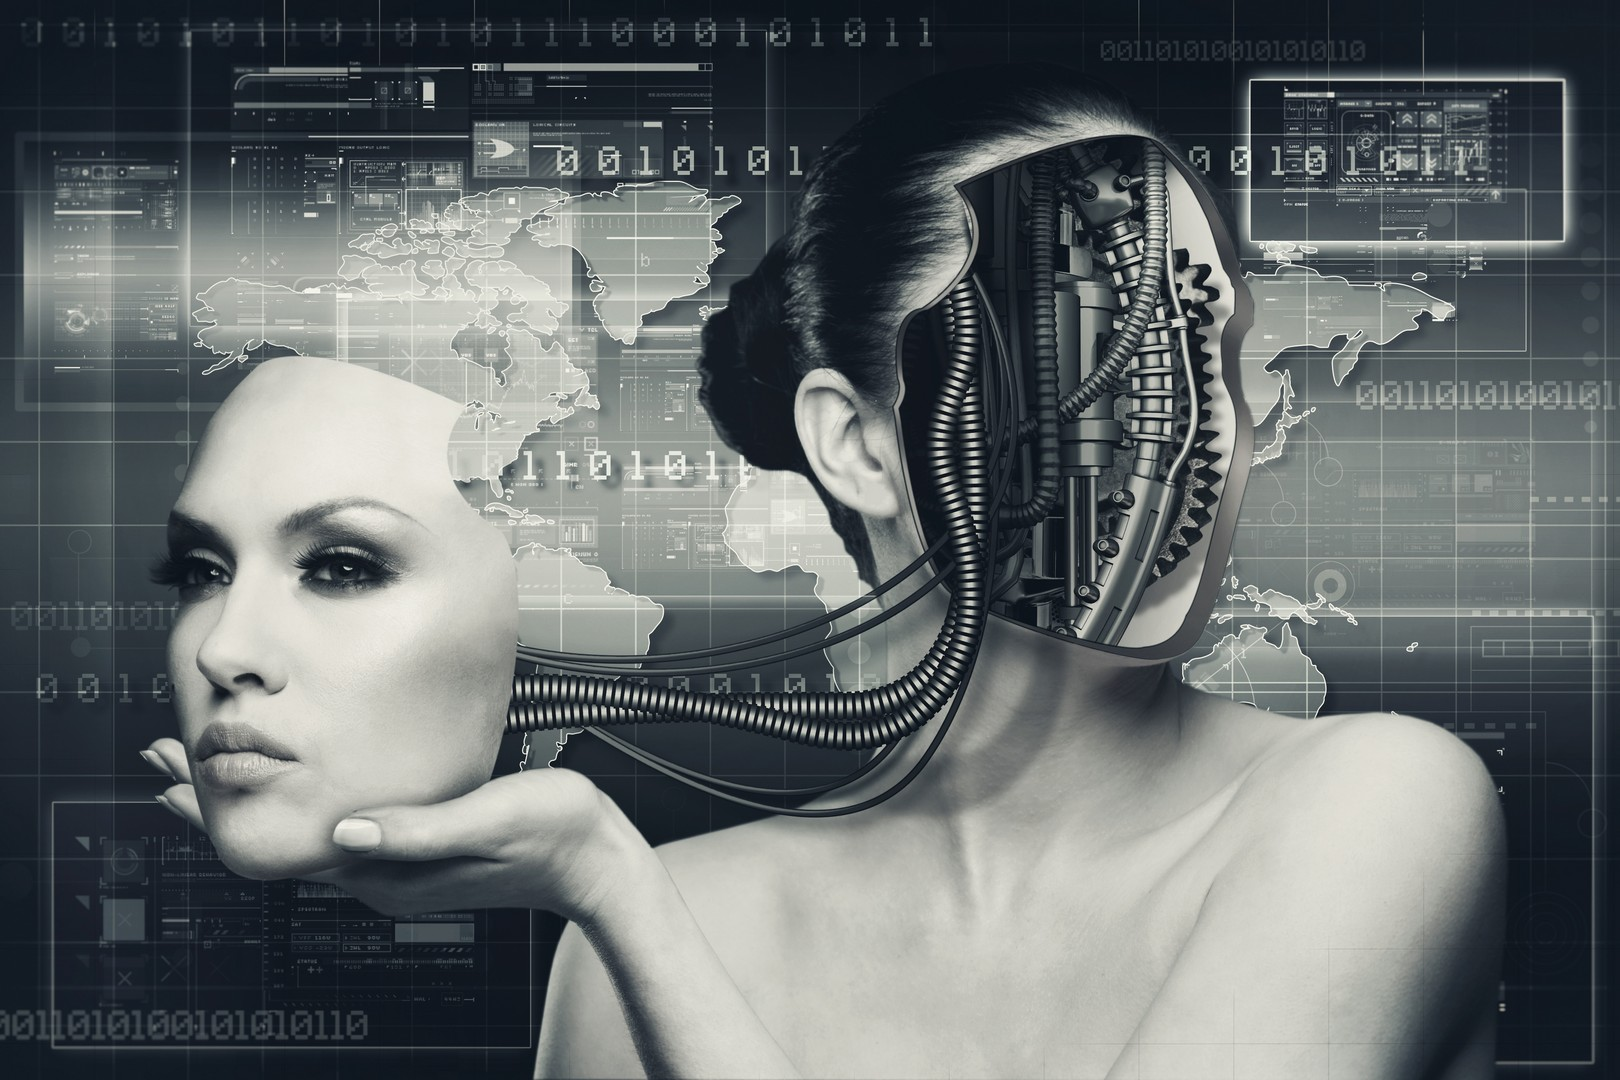 Digital Immortality